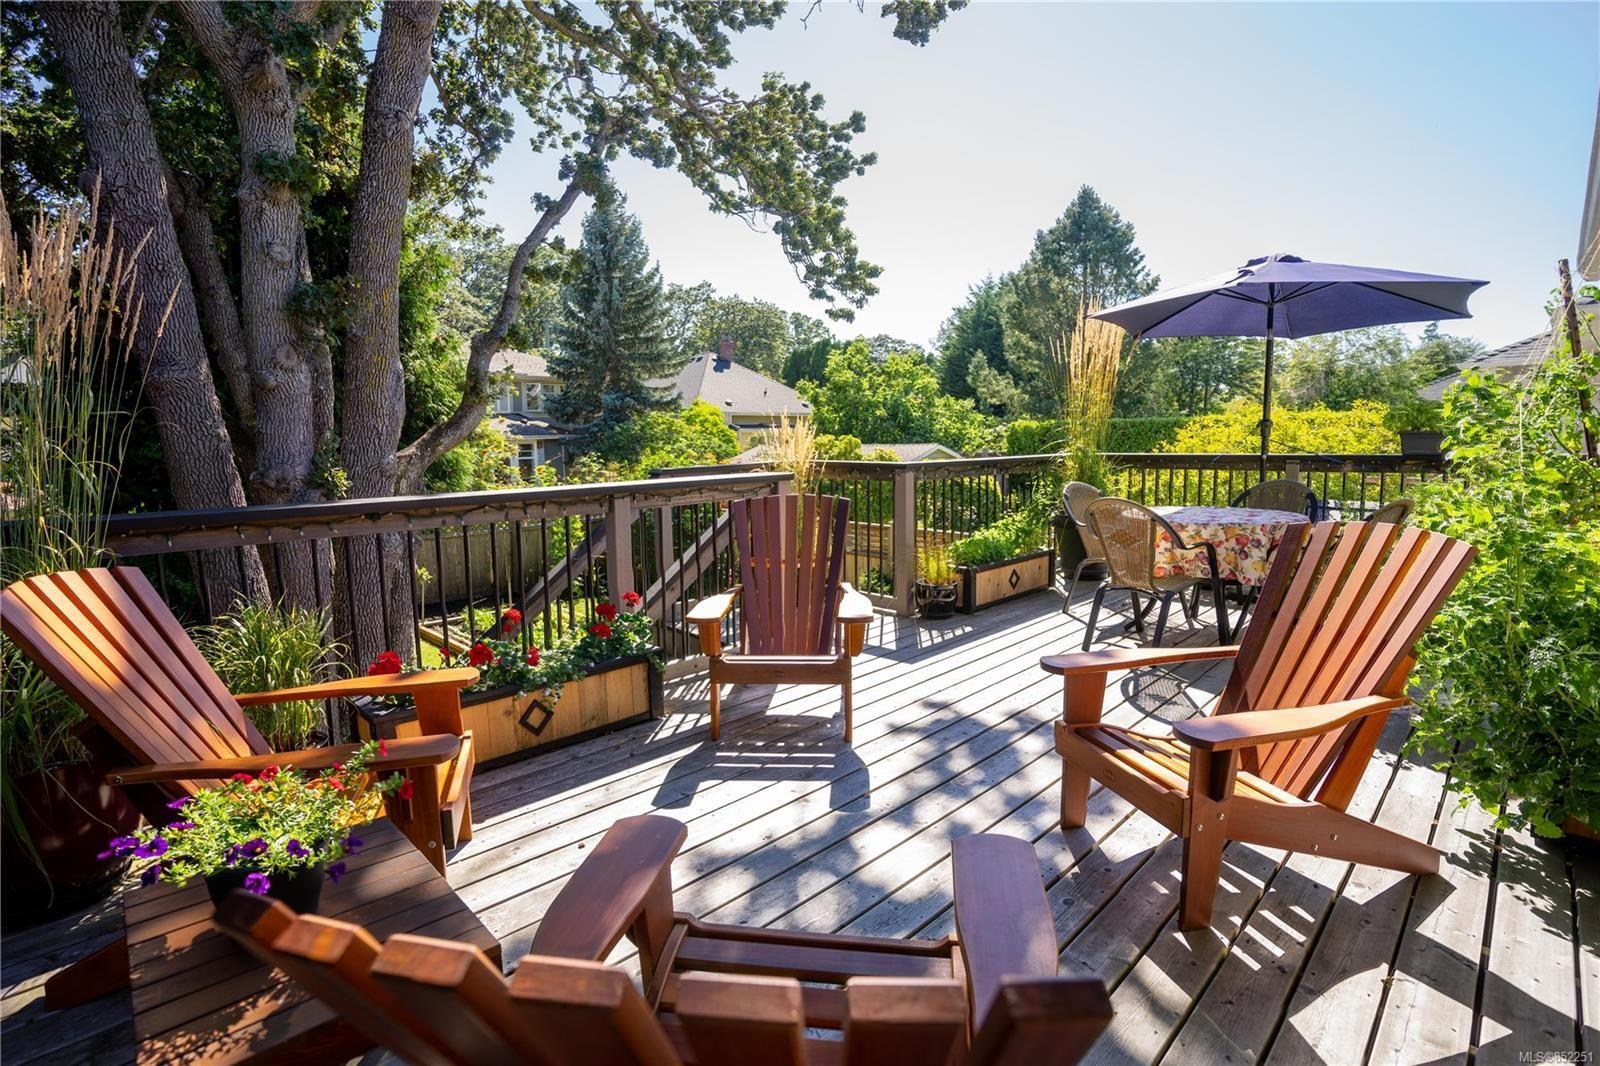 Photo 28: Photos: 2363 Pacific Ave in : OB Estevan House for sale (Oak Bay)  : MLS®# 852251